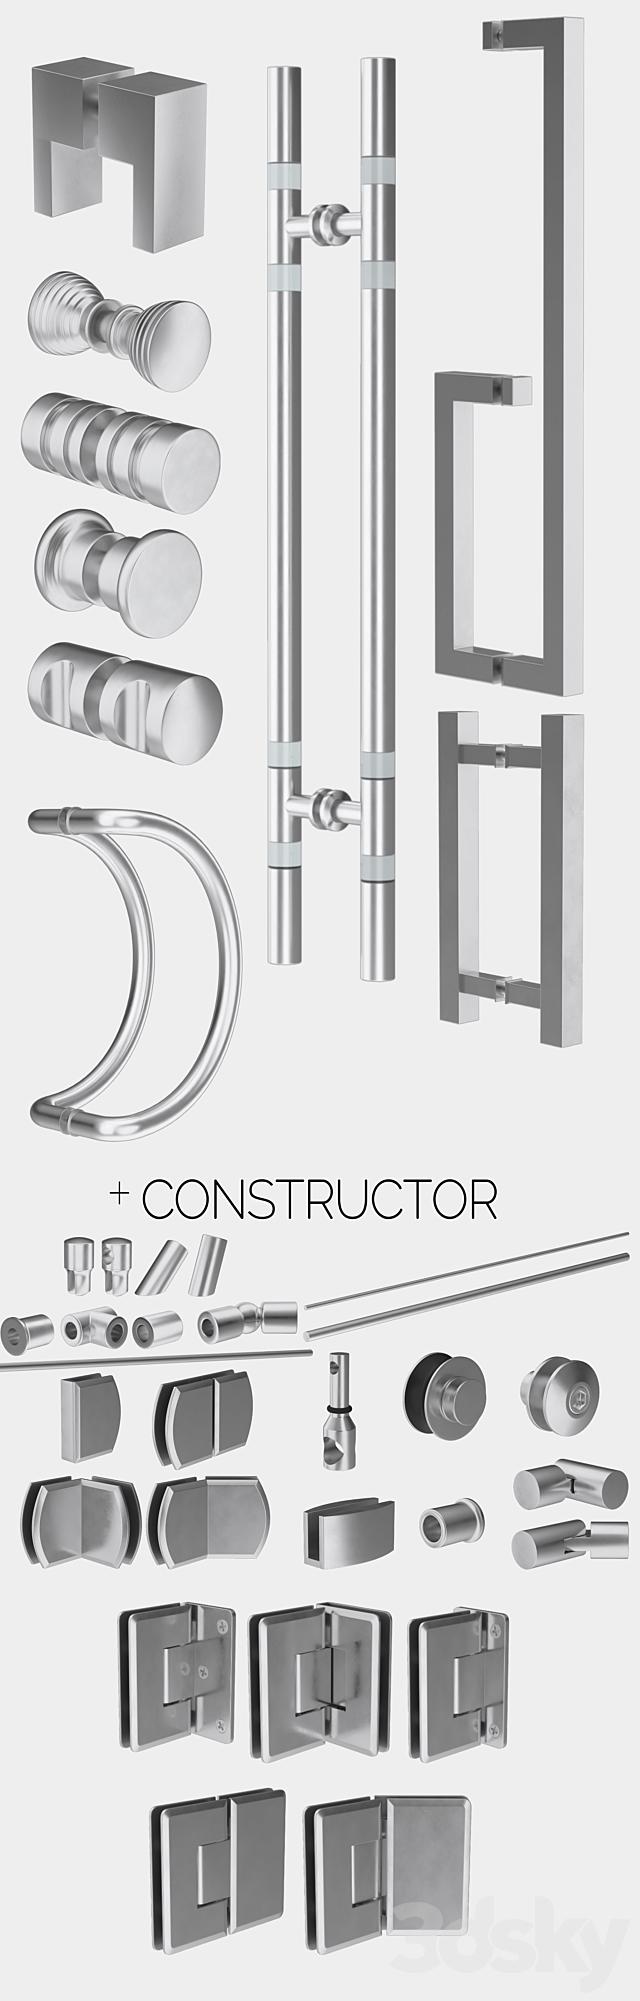 Glass shower cabins, designer and a set of handles